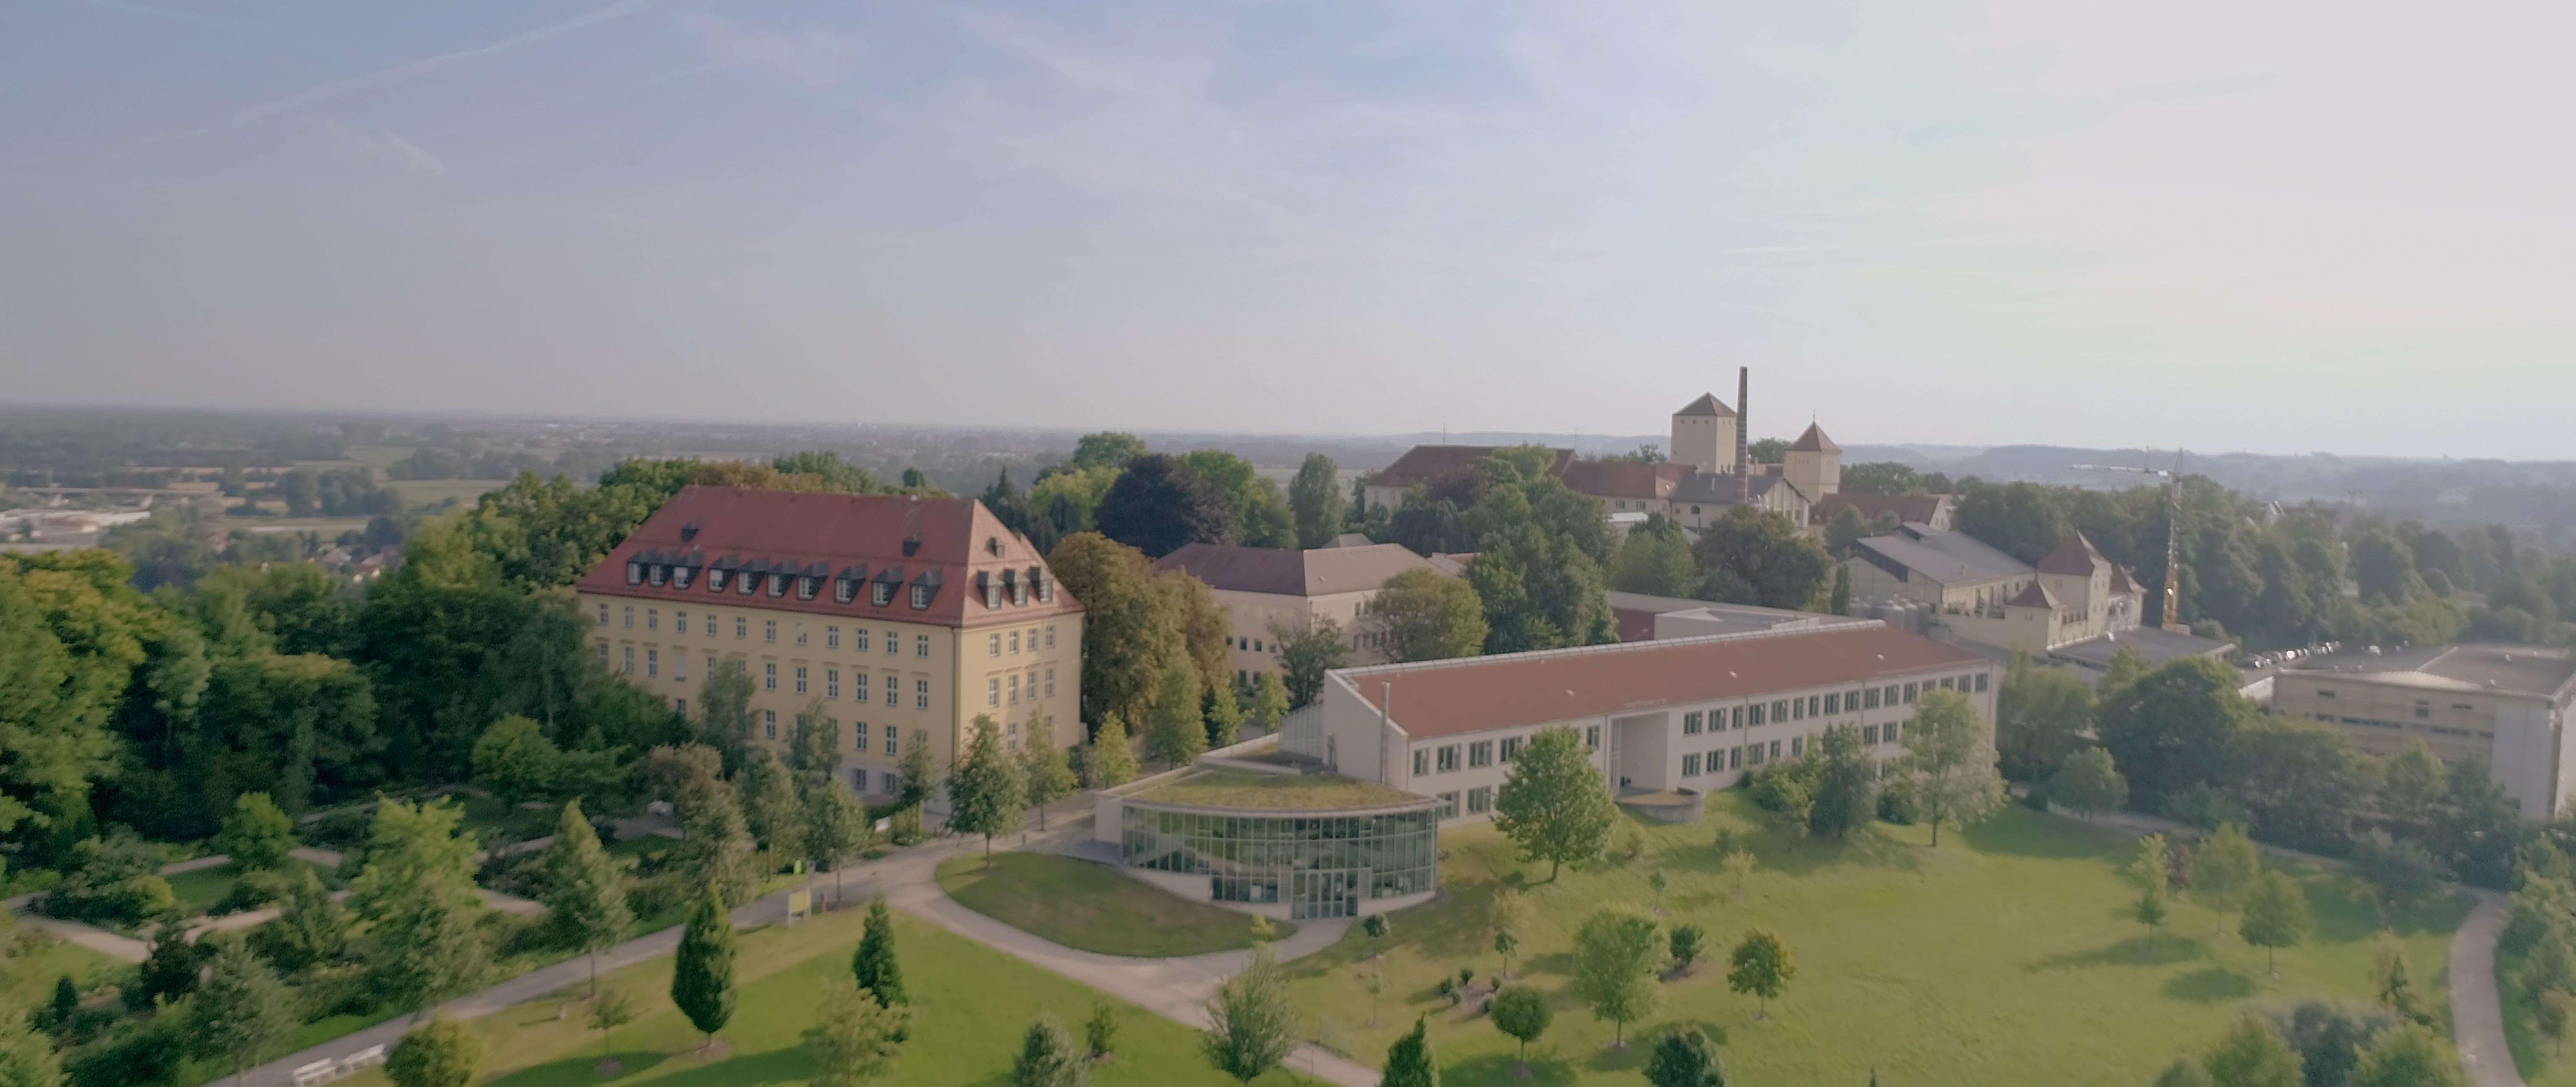 Campus Weihenstephan: Mentoringprogramm an der Fakultät BI